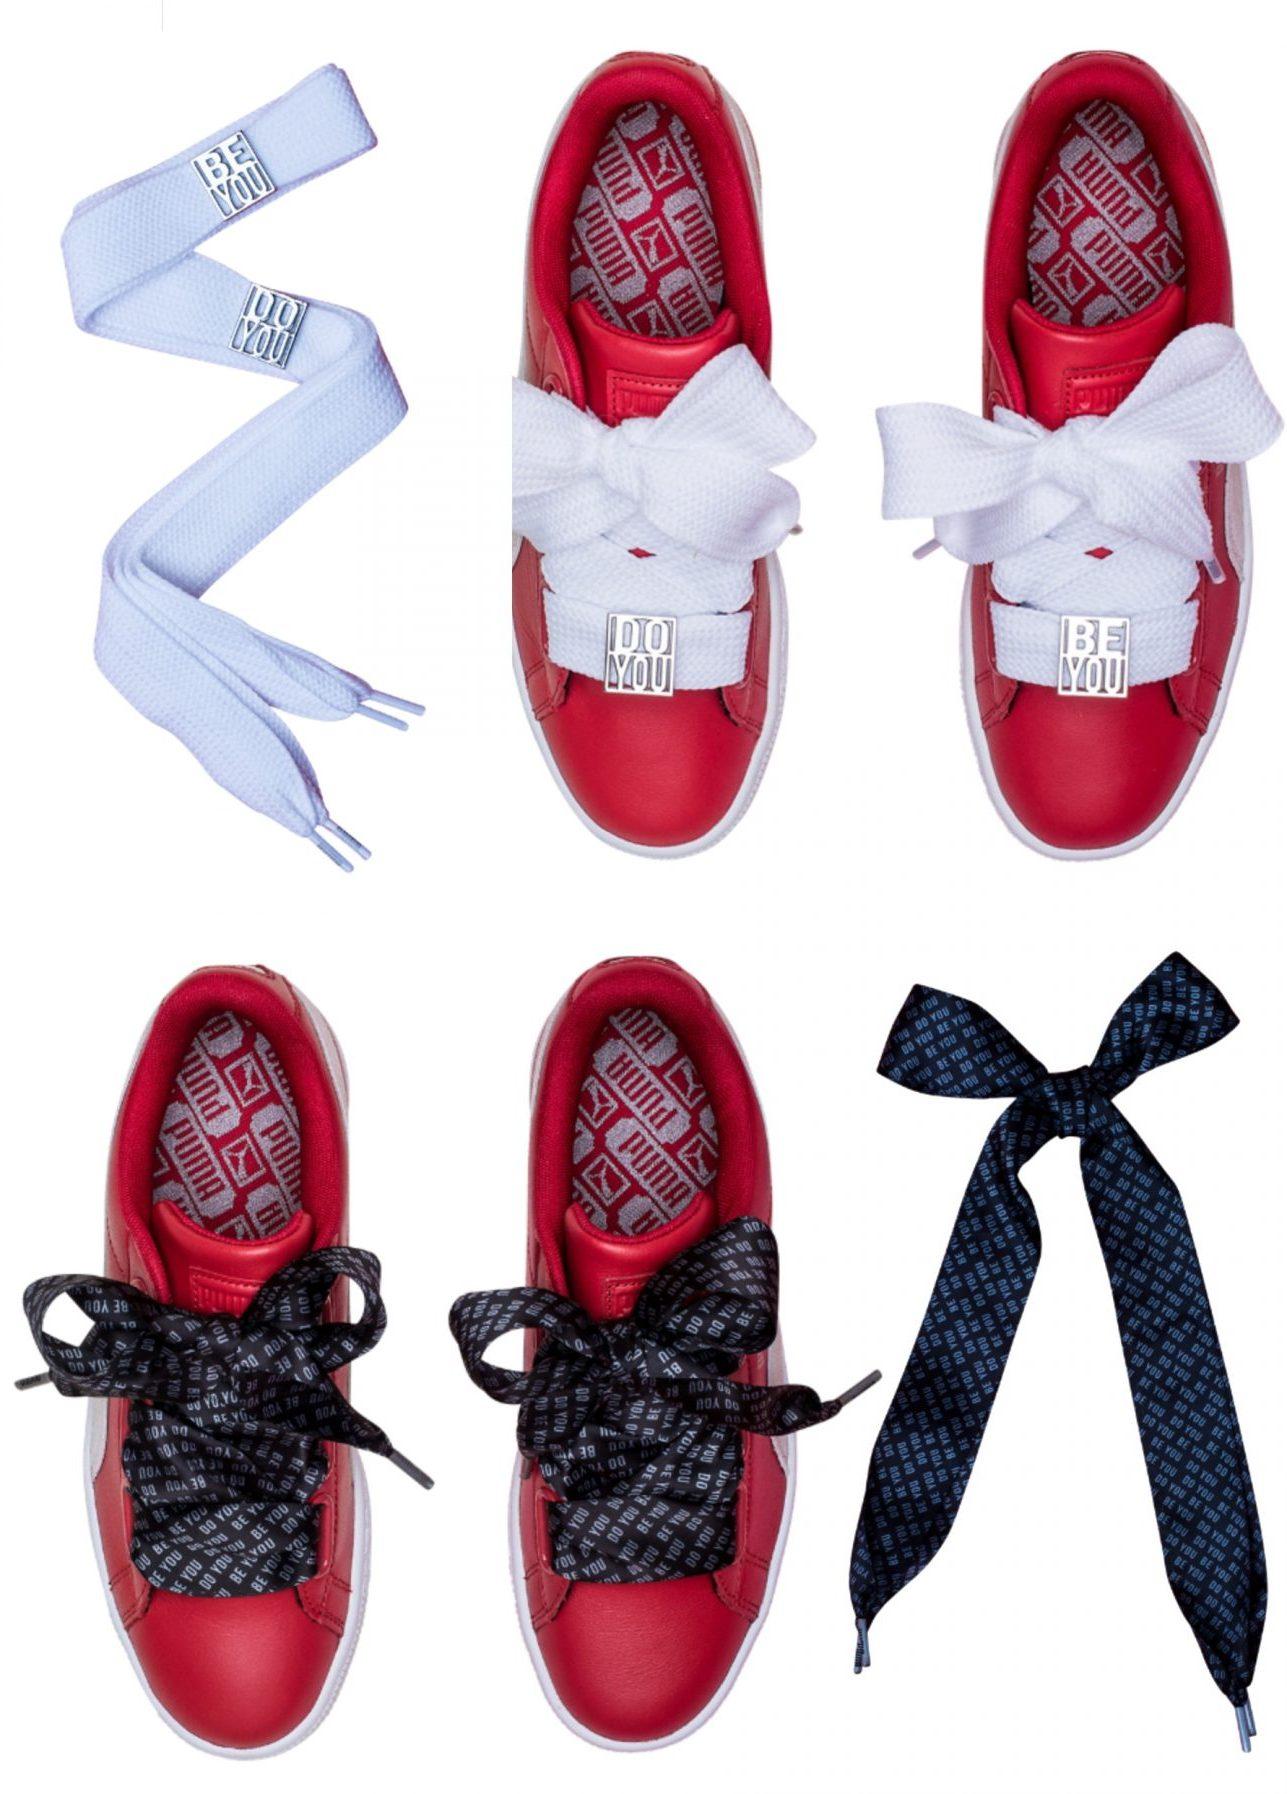 foot locker Puma Heart Cara Delevingne Laces lappoms lifestyle blog